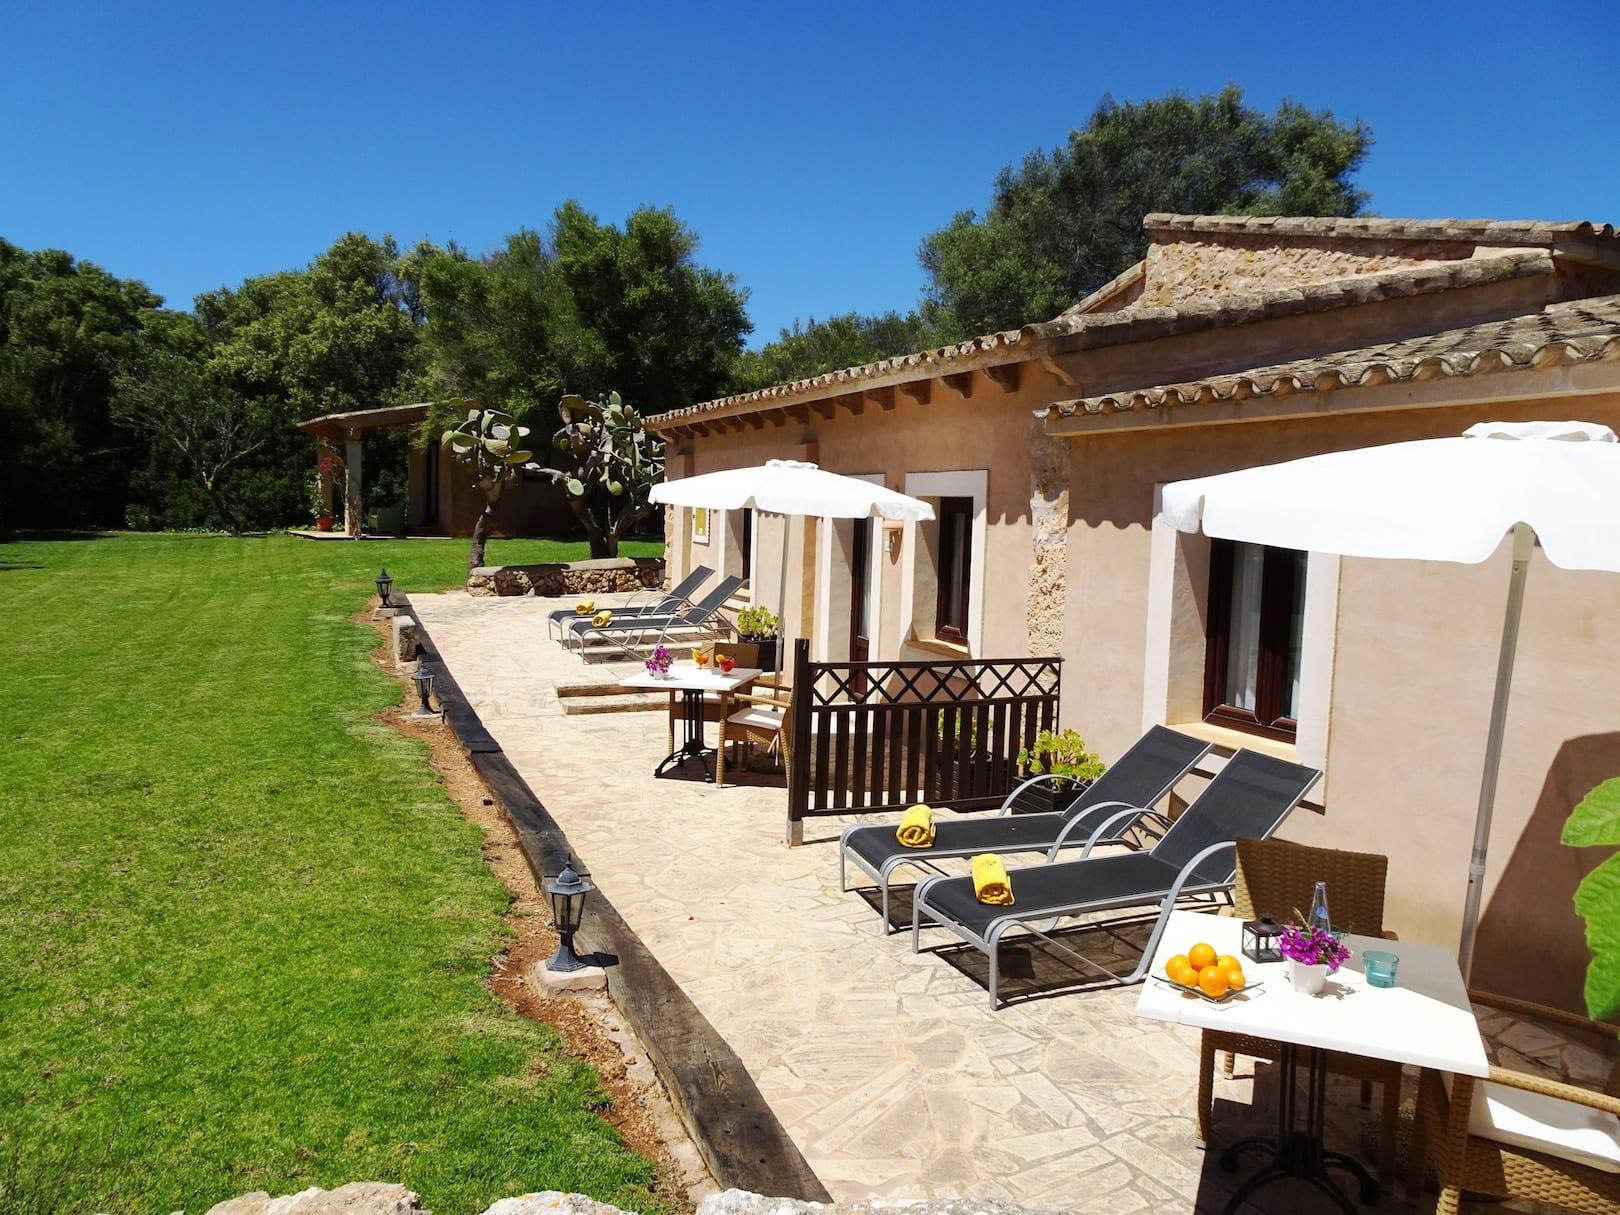 ISLA_Travel_Hotel_Sa_Galera_Terrasse